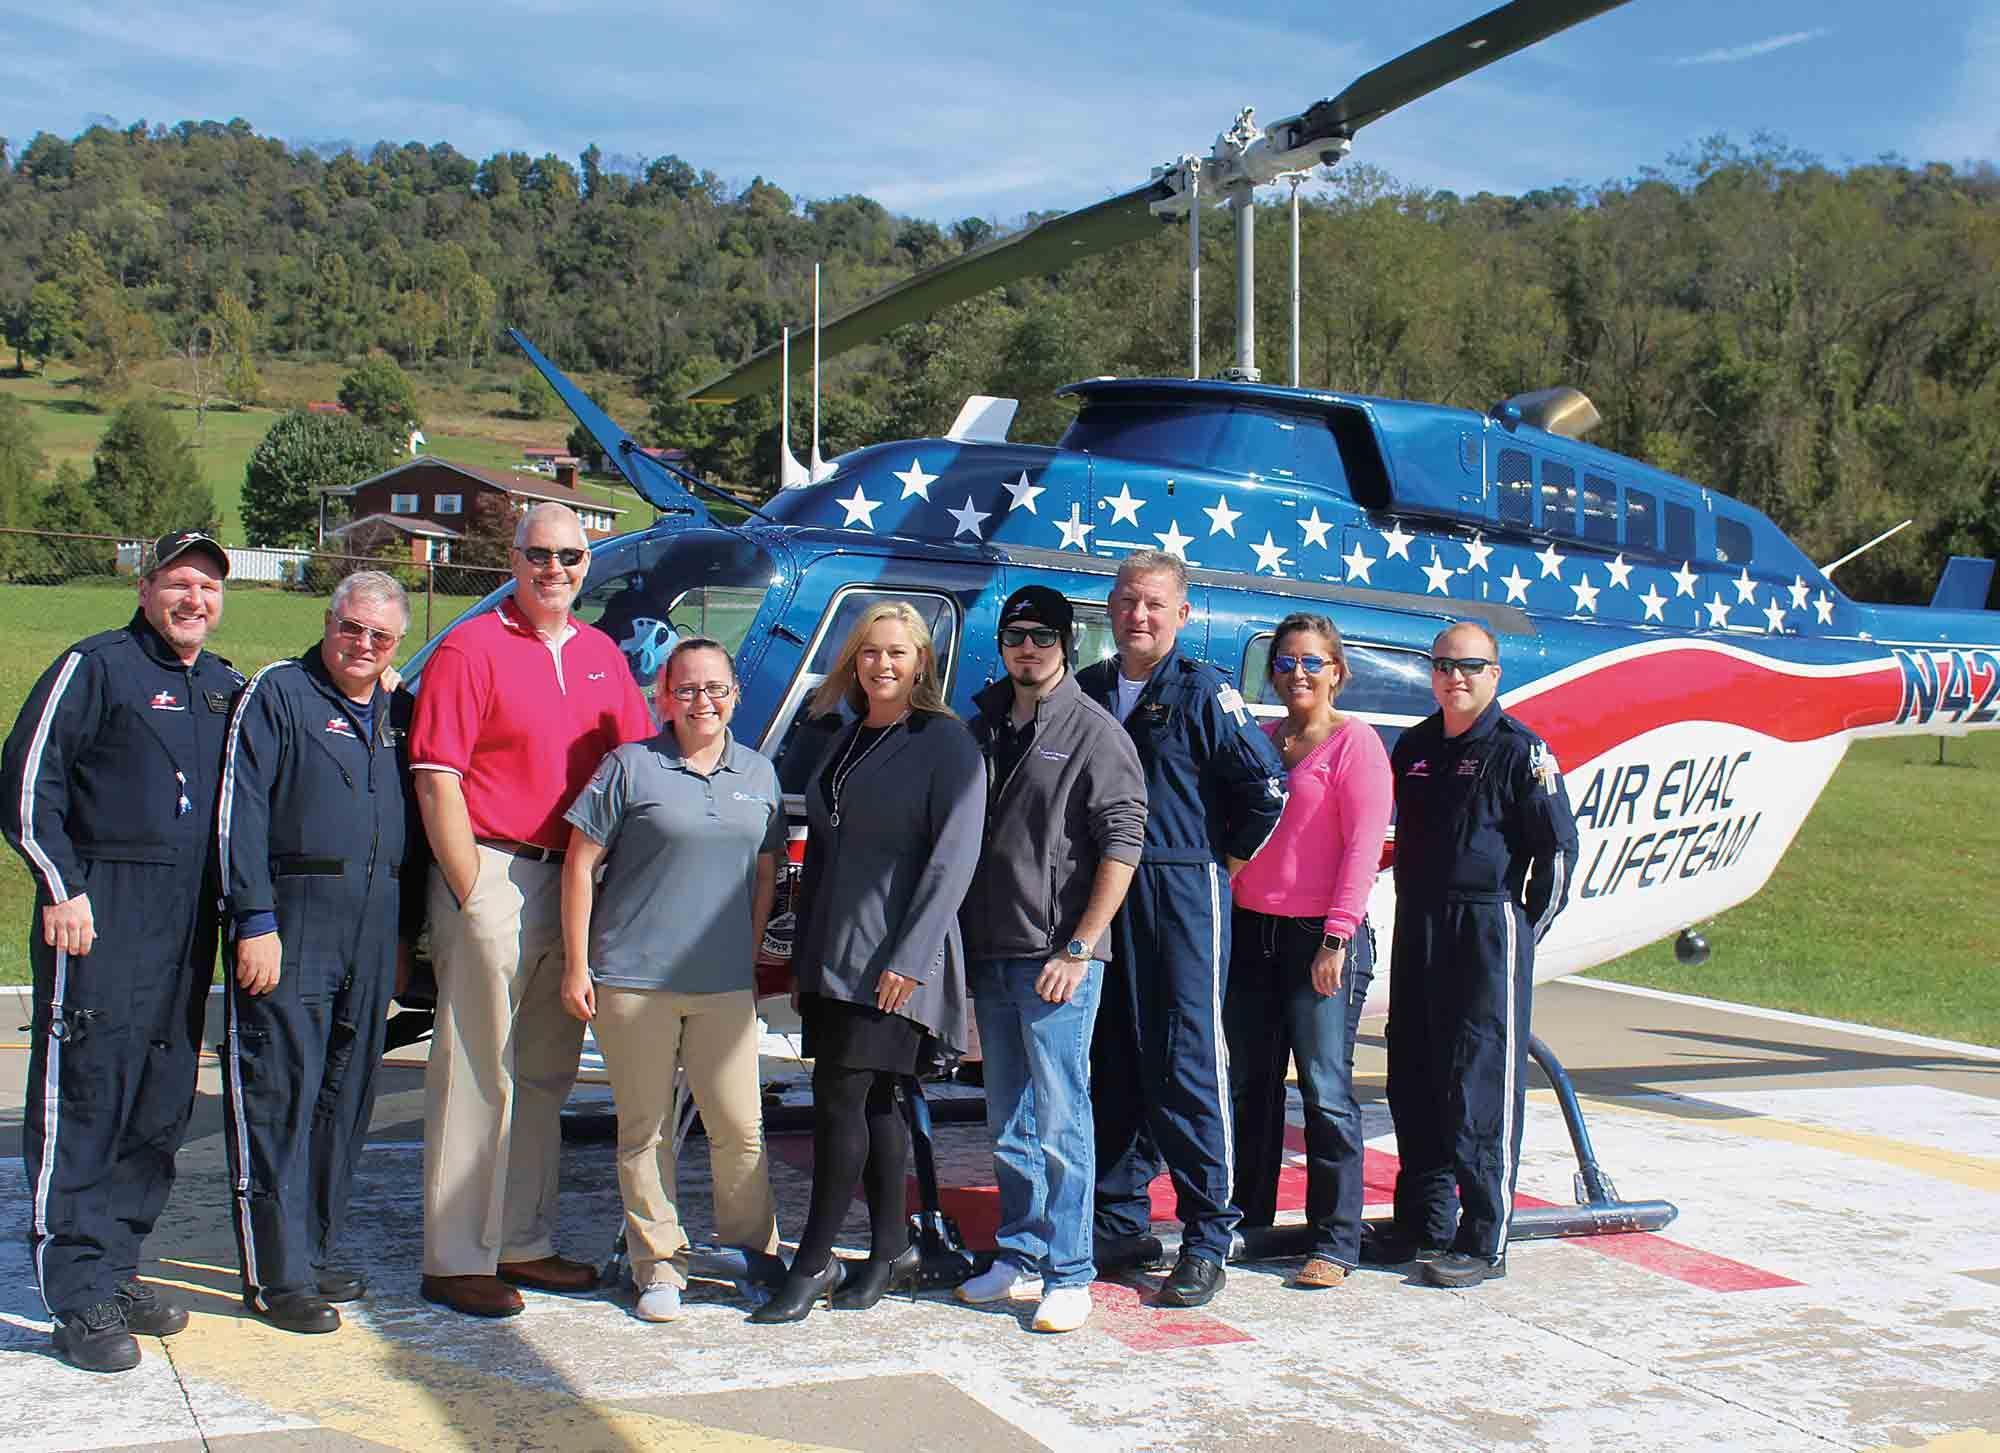 Air Evac Lifeteam celebrates 10th anniversary 10